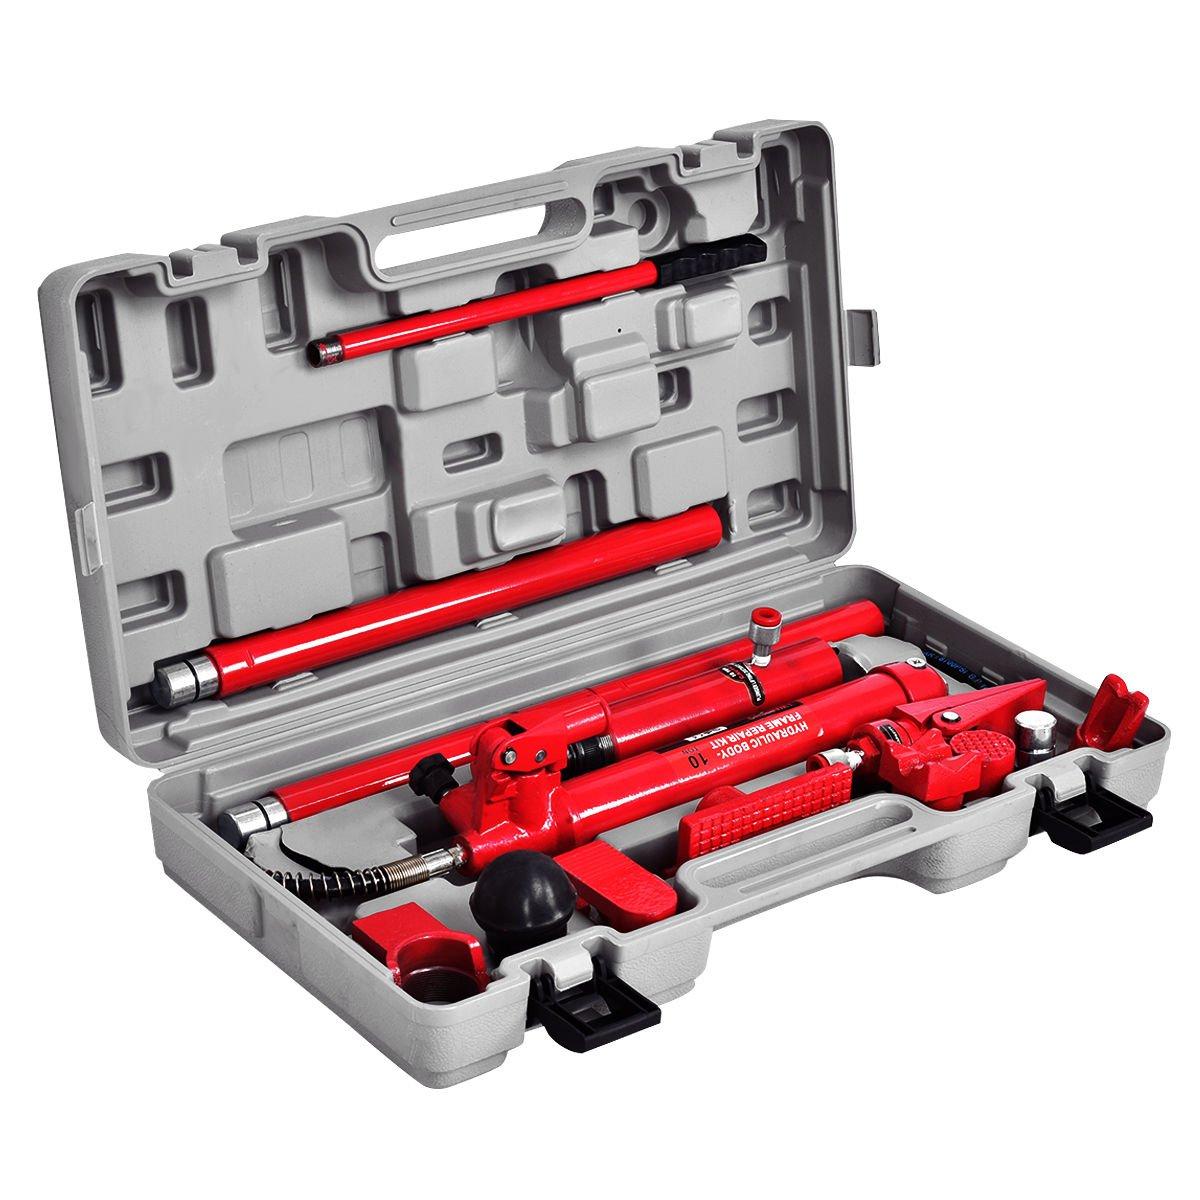 Goplus Porta Power Hydraulic Jack Auto Body Frame Repair Kit Shop Tool Lift Ram w/Carrying Case, 10 Ton Capacity